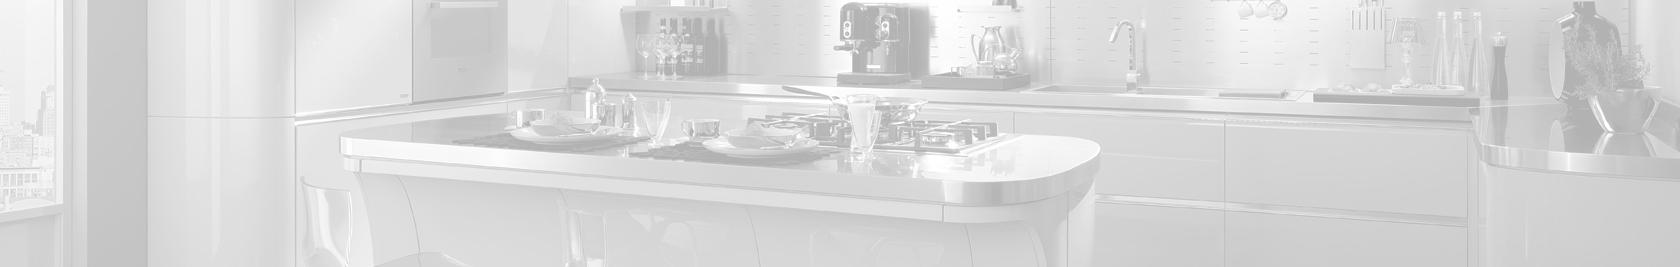 cucine scavolini firenze Archivi - Ellegi Mobili